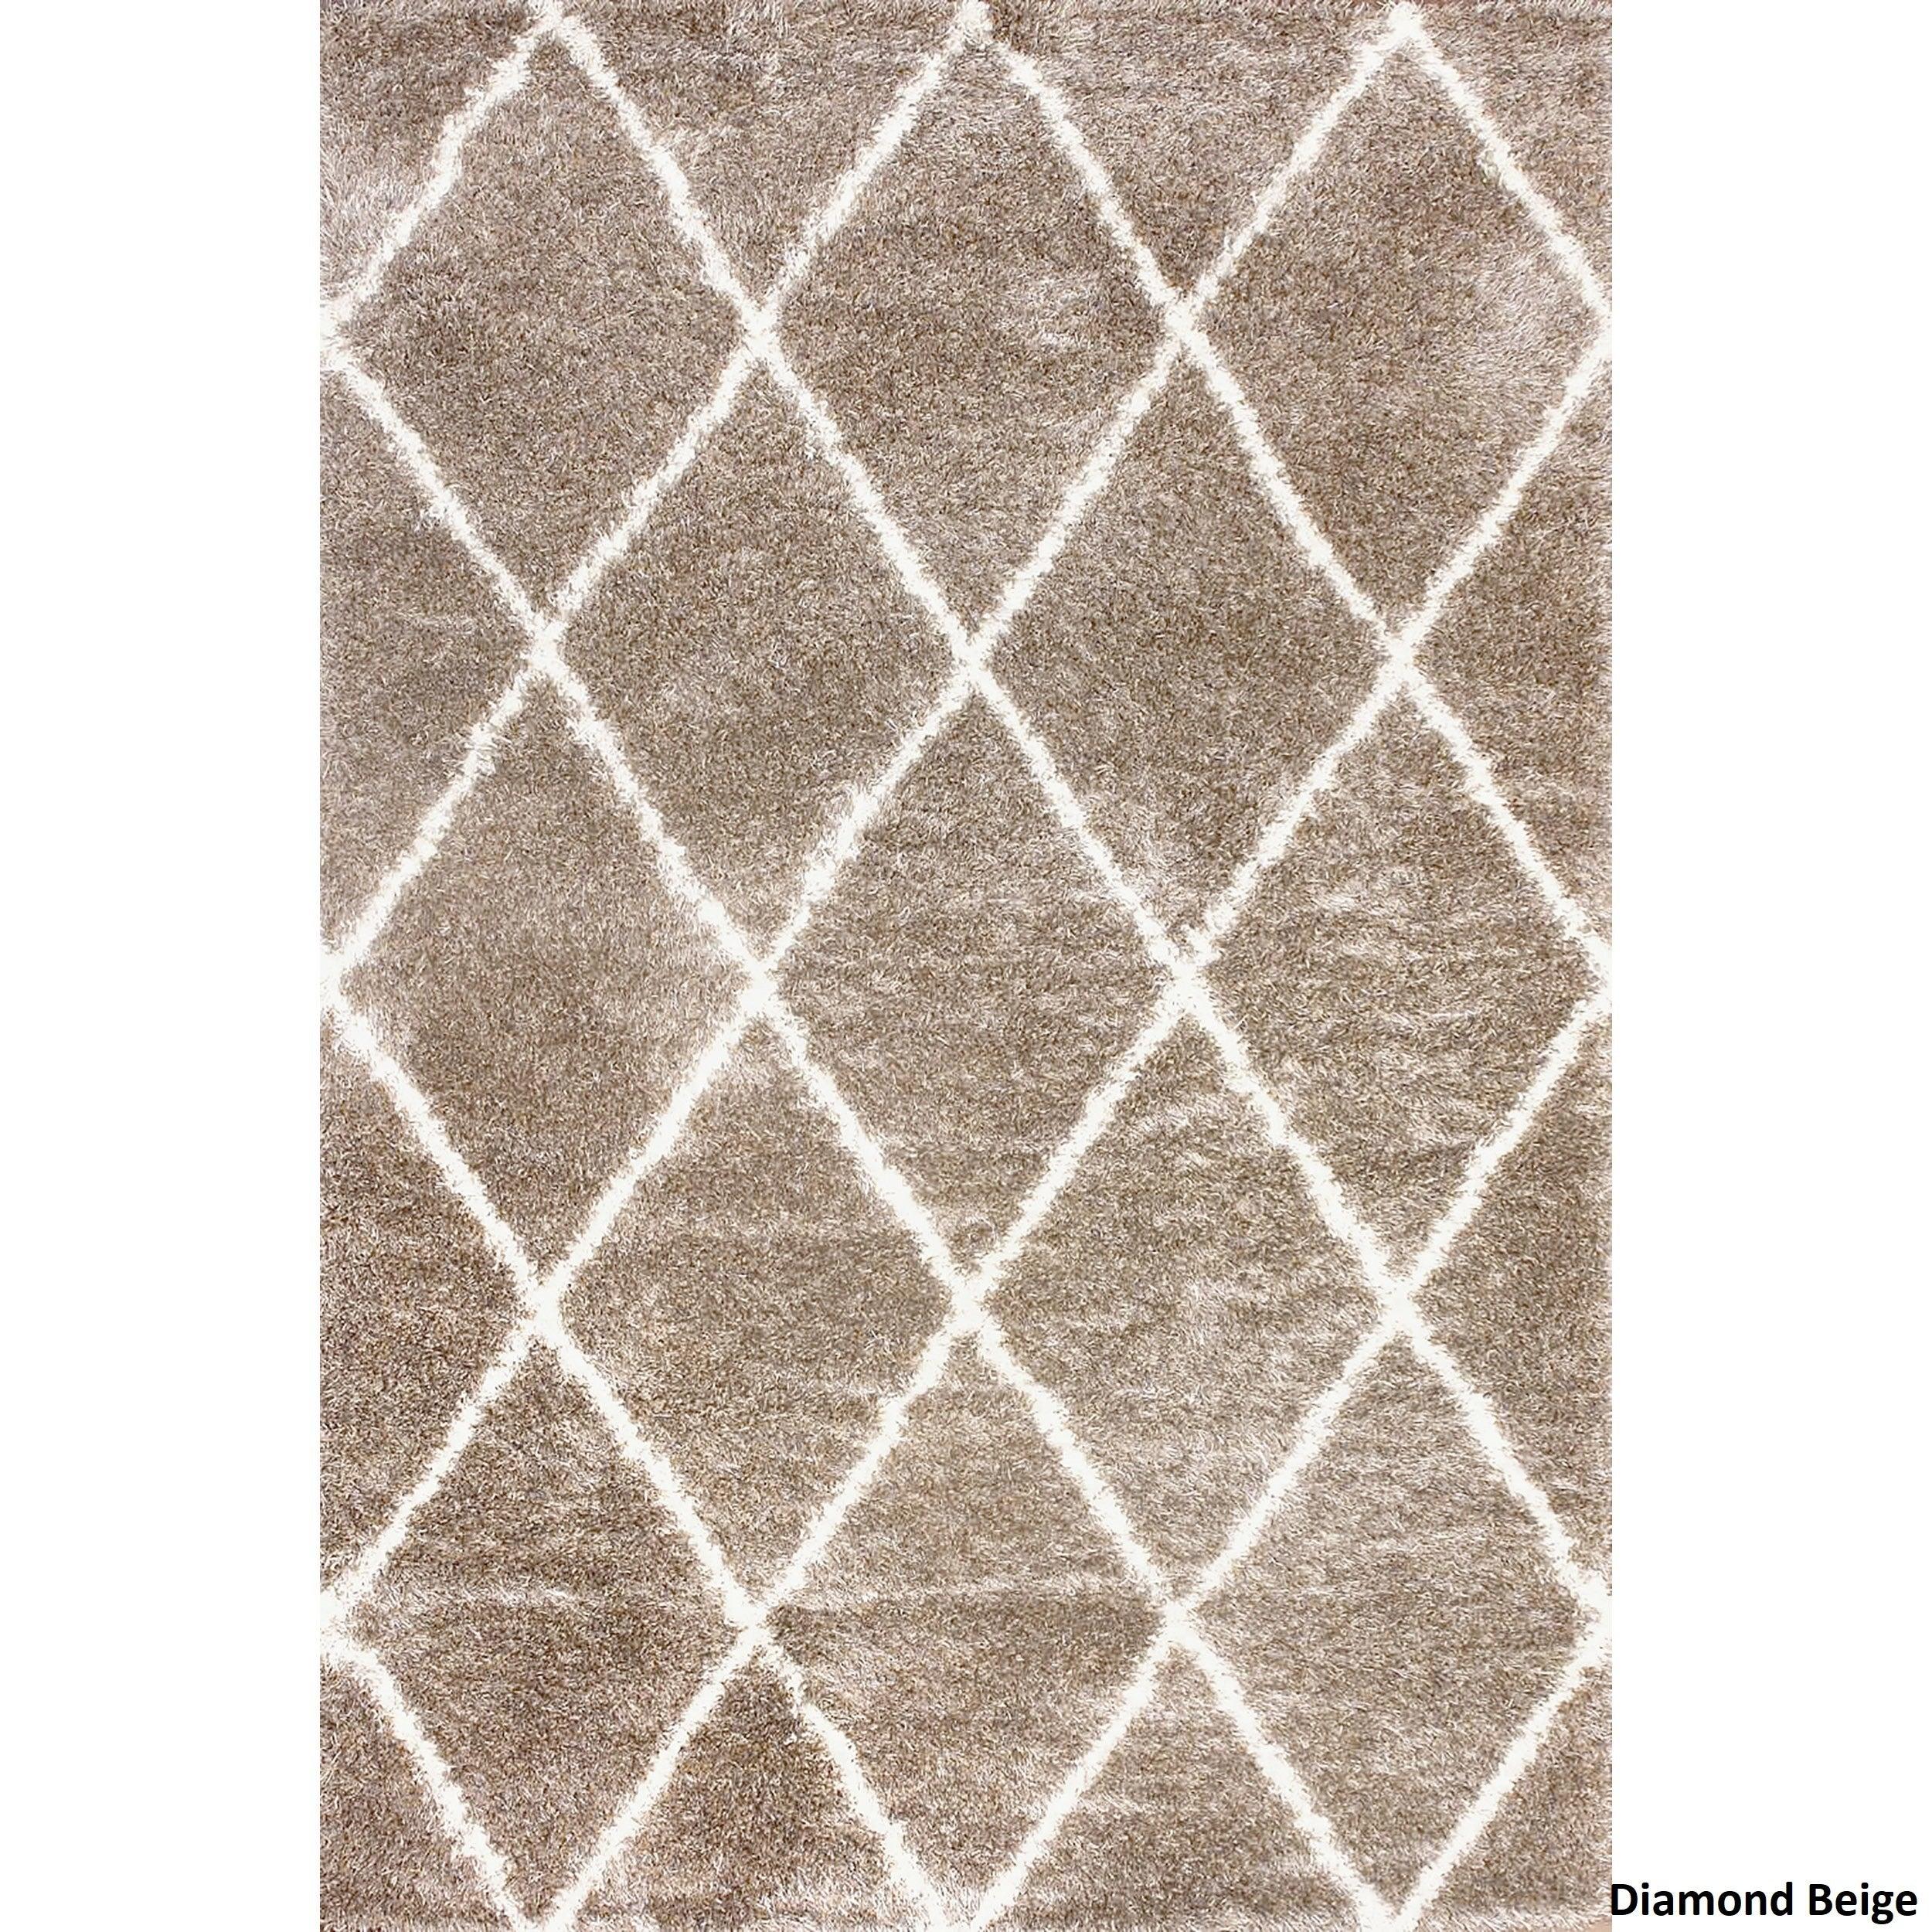 nuloom moroccanstyle trellis shag rug (' x ' )  free shipping today overstockcom  . nuloom moroccanstyle trellis shag rug (' x ' )  free shipping